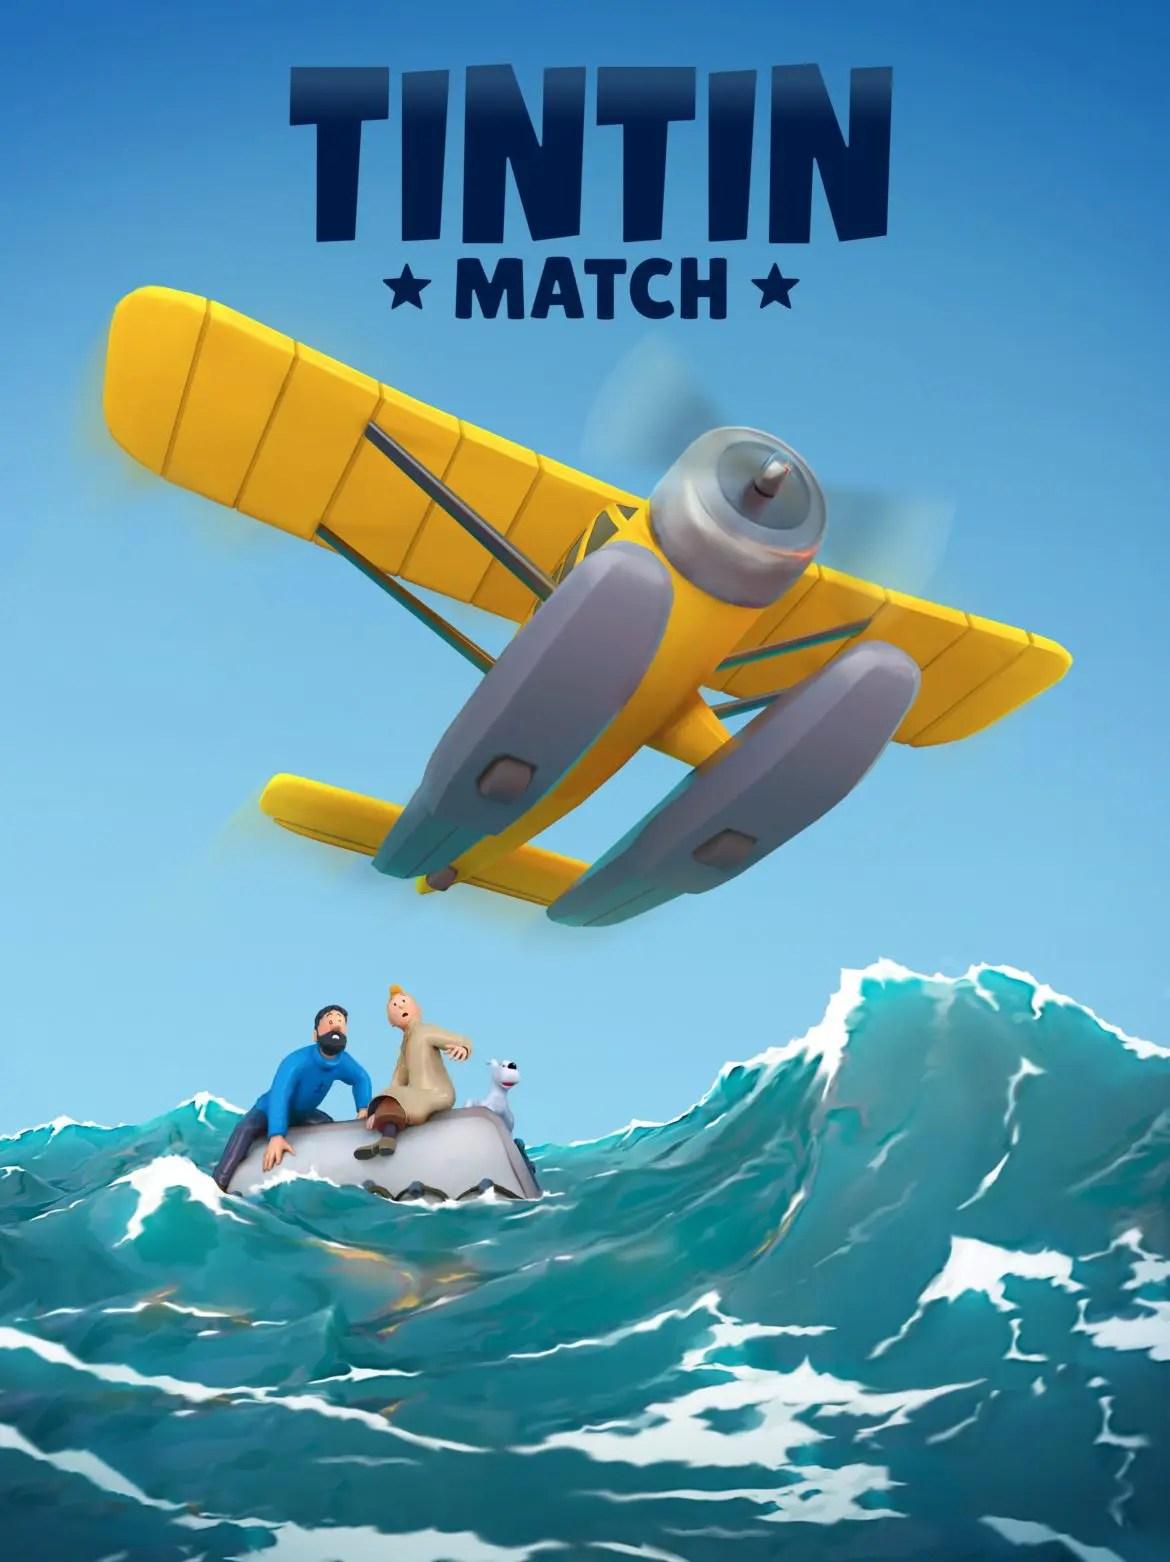 Tintin match recension